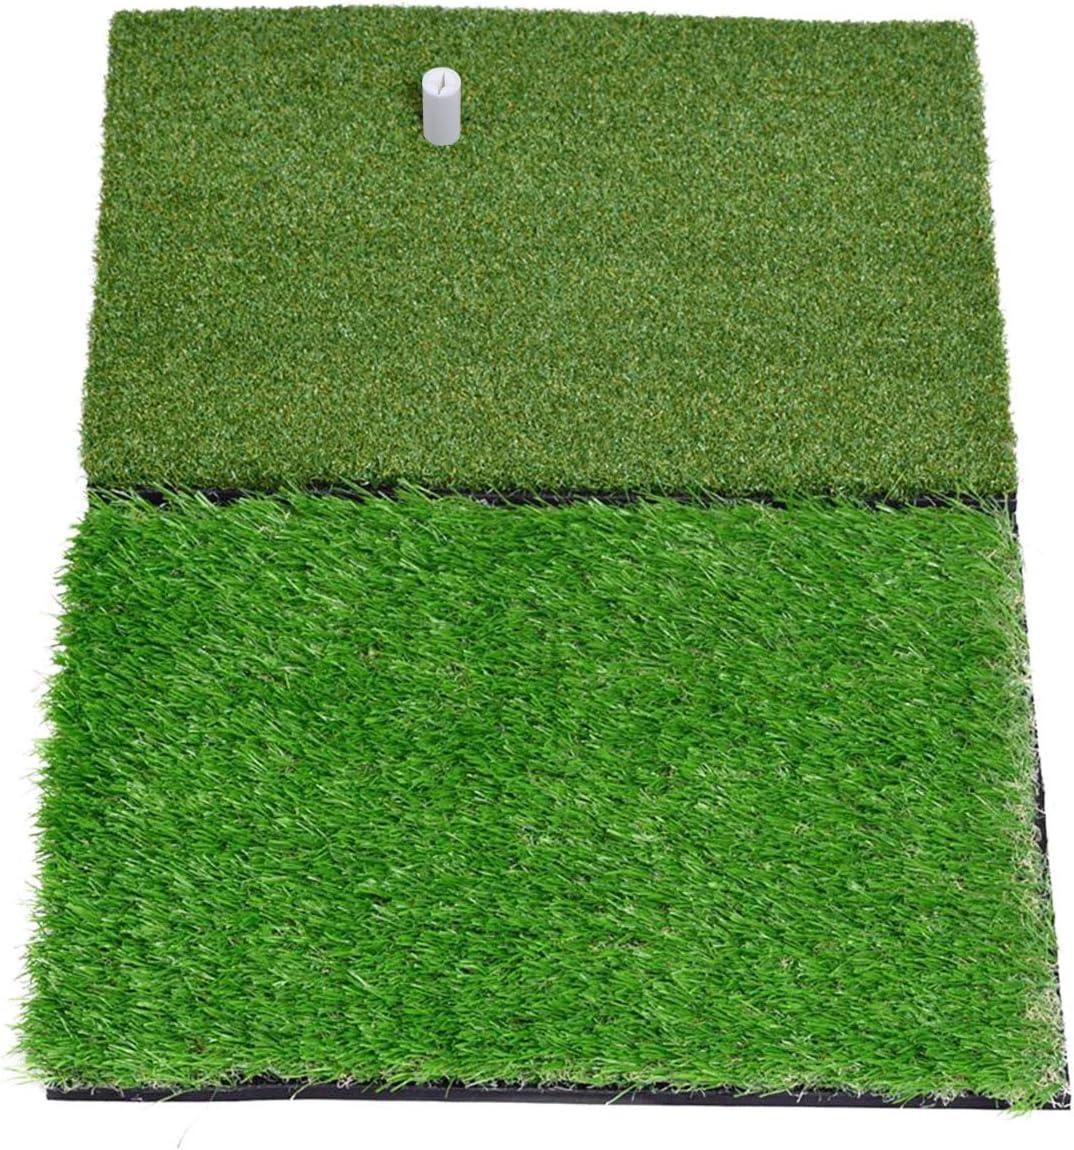 SkyLife Dual-Turf Golf Hitting Grass Mat, Portable Training Fairway Rough Turf, Driving Chipping Golf Equipment, Home Backyard Garage Outdoor Practice